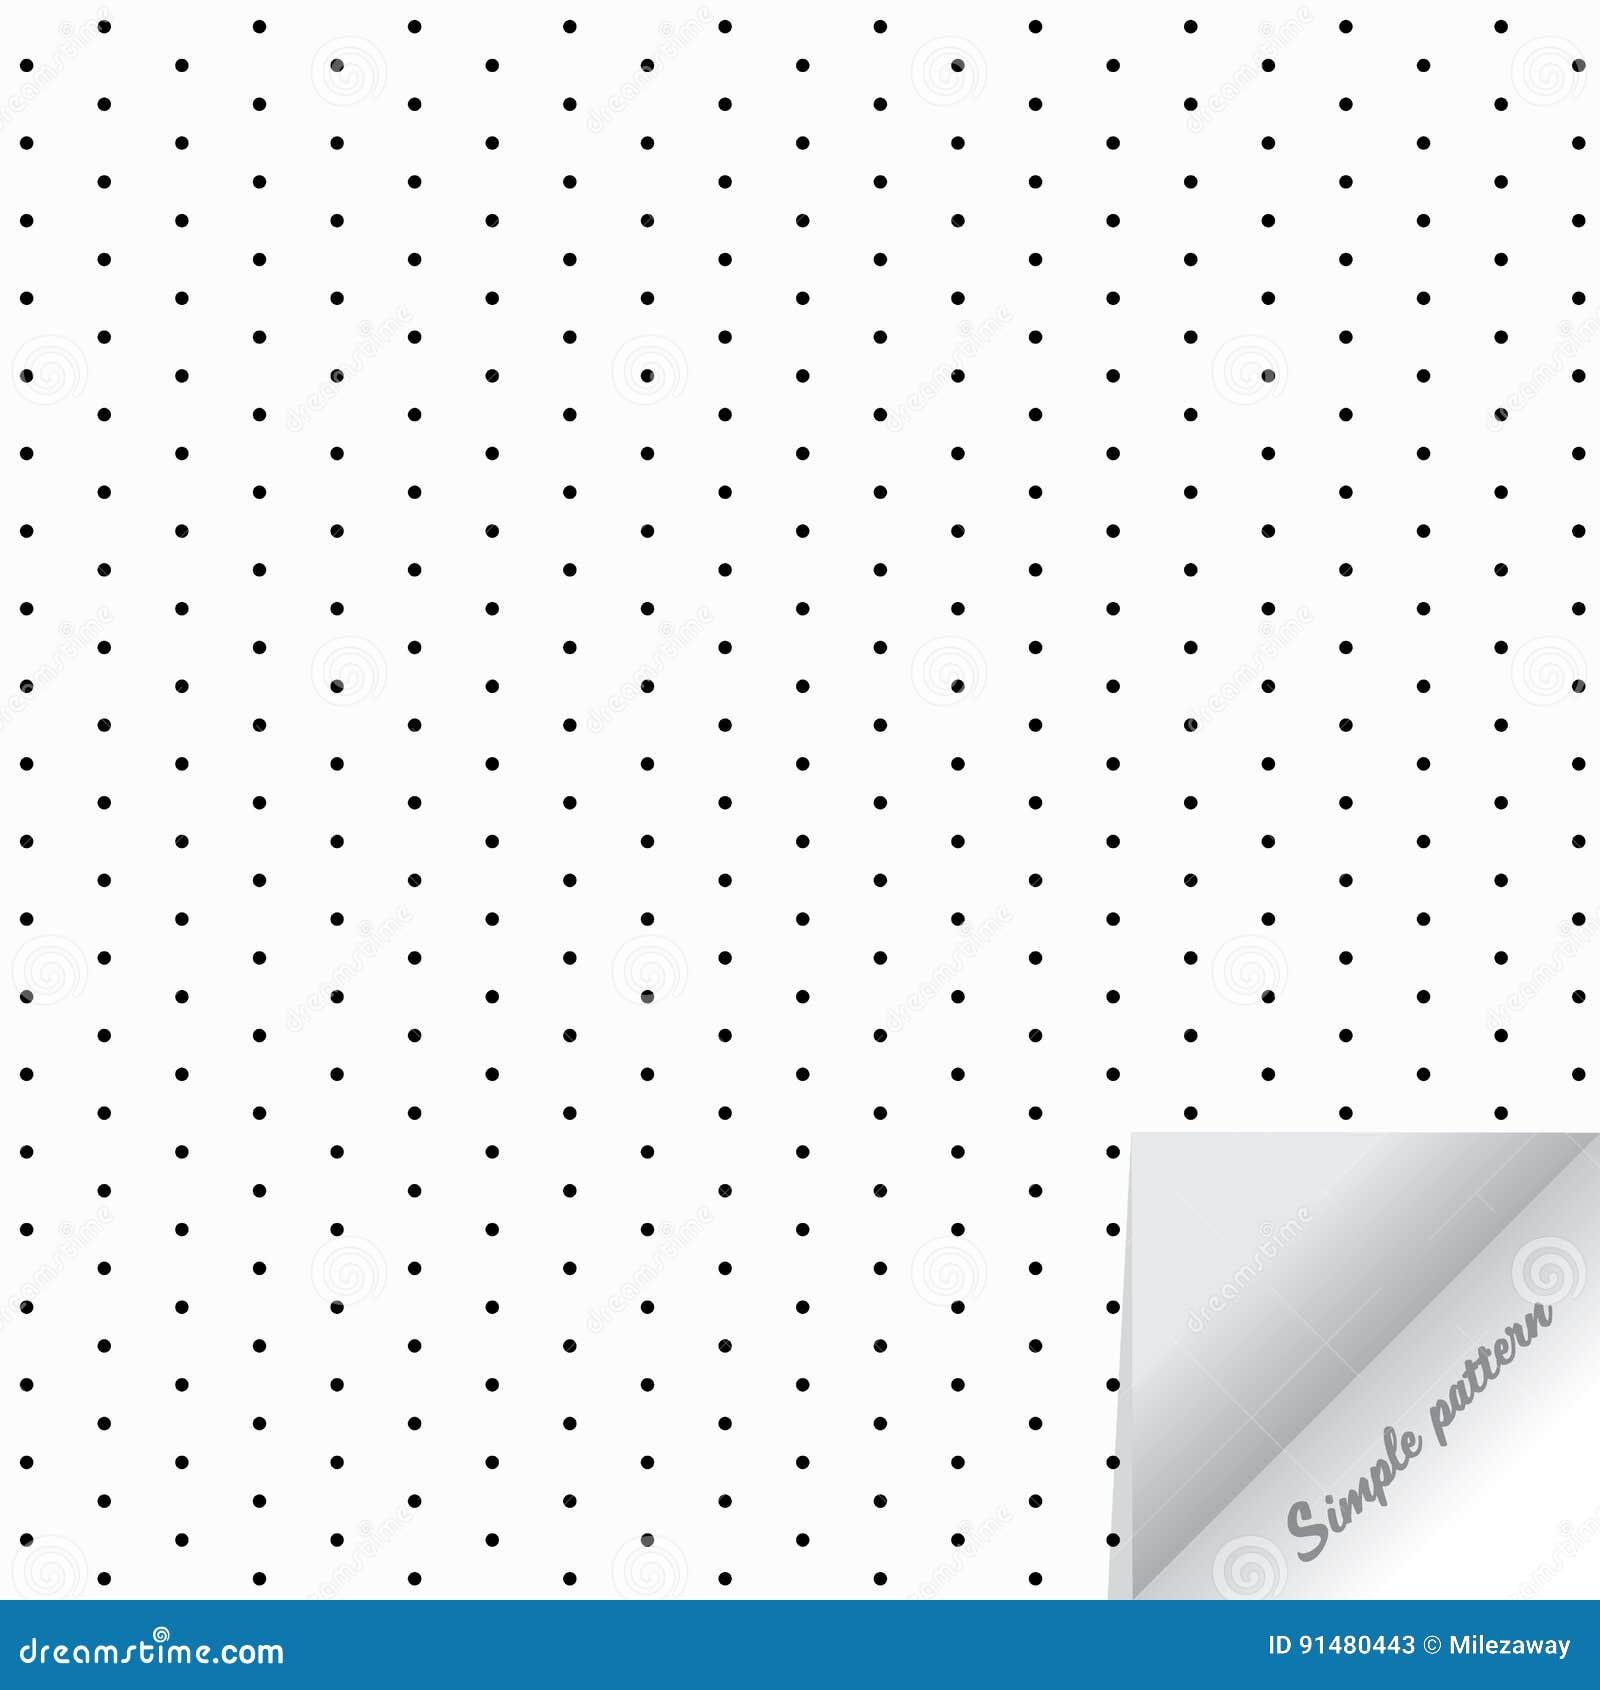 Geometrisk prucken vektormodellrepetition, cirkel, grå prick på vit bakgrund med realistisk pappers- flip